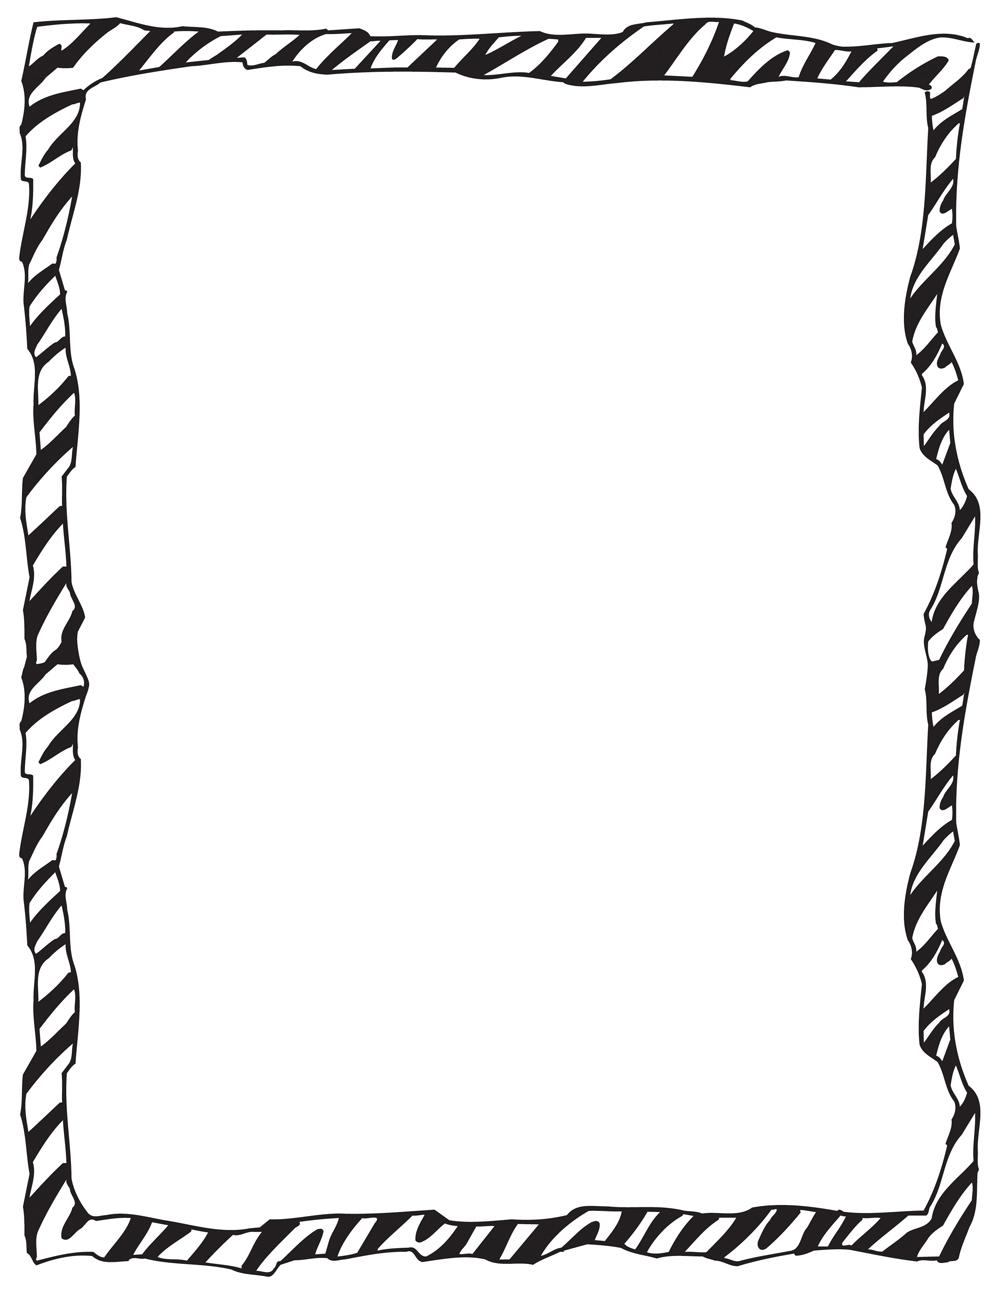 Zebra Print Border Template Print Border Template